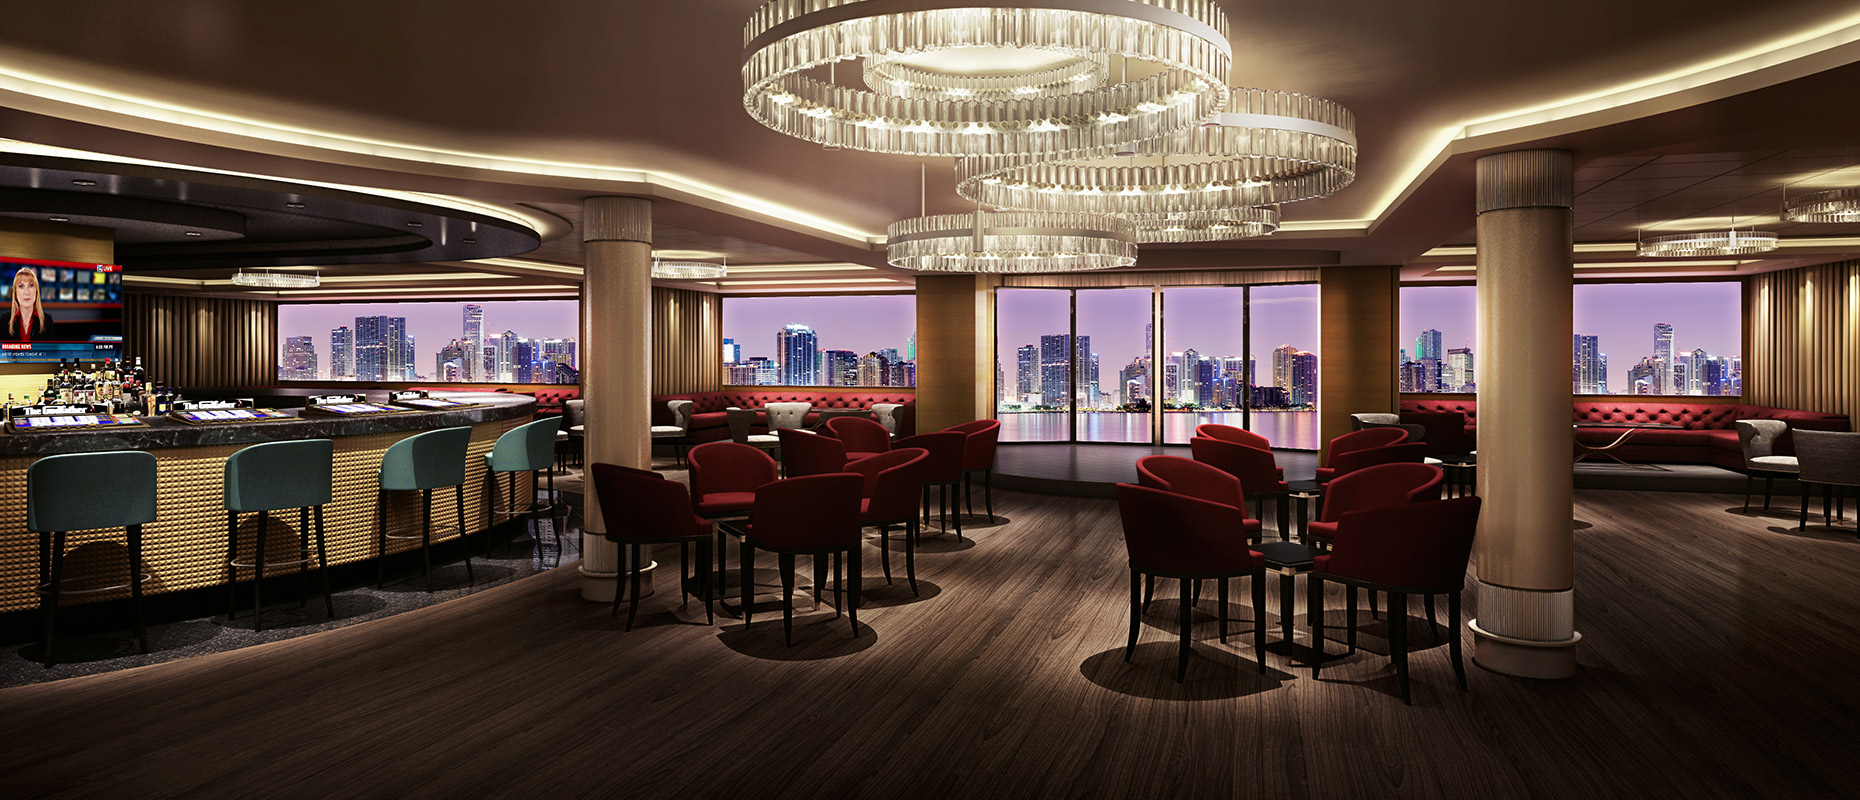 Norwegian Cruise Line Norwegian Escape Interior Skyline bar.jpg